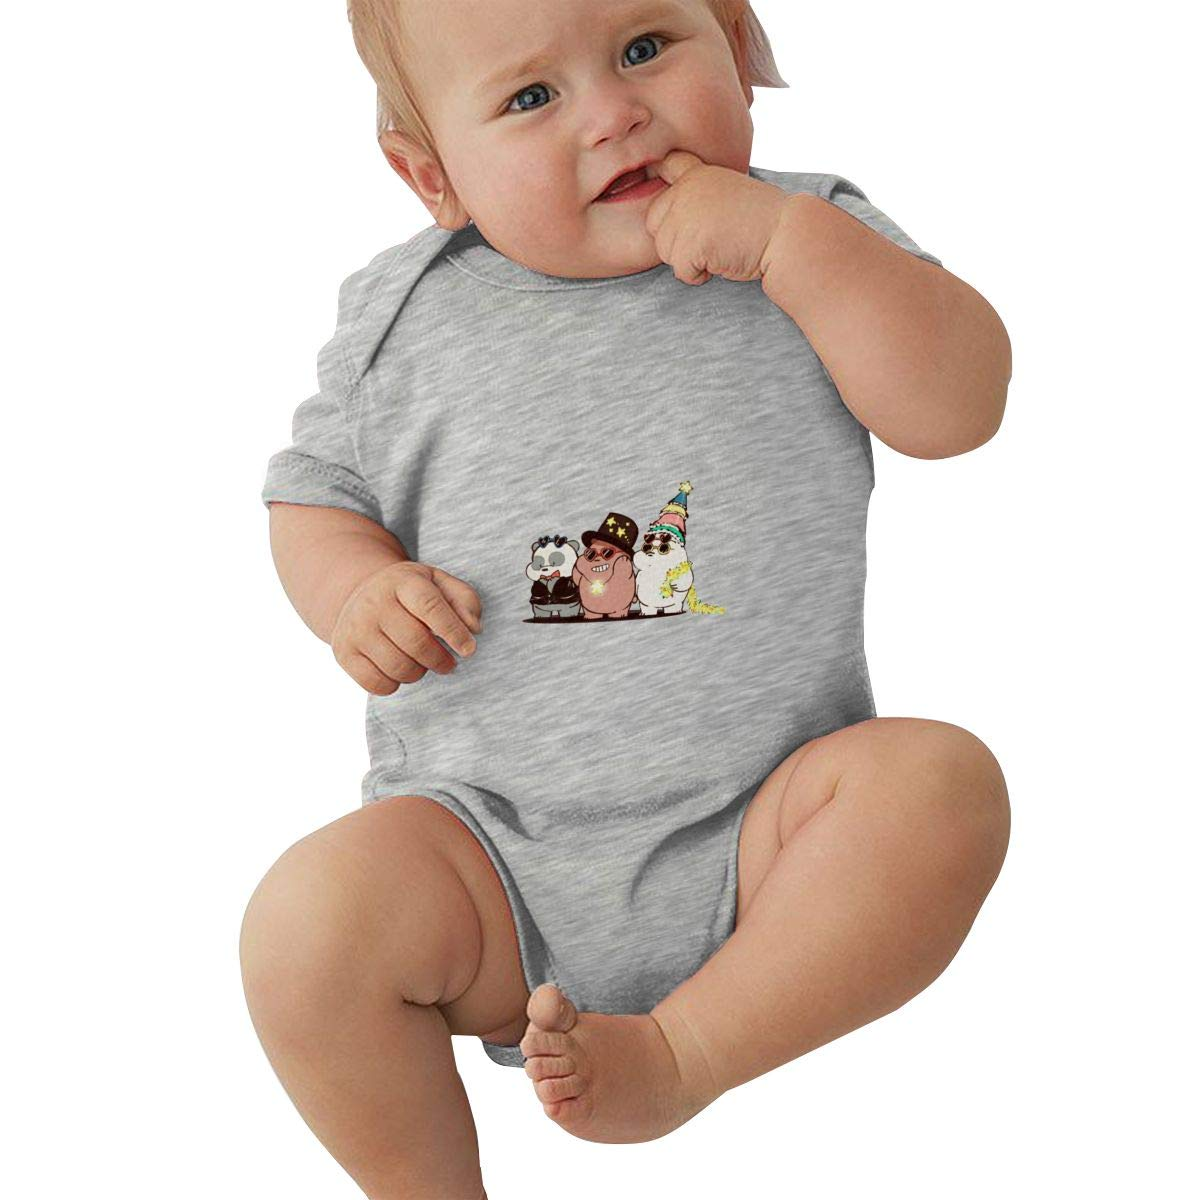 LuYiDa Unisex Baby Crew Neck Short-Sleeve Romper We Bare Bears Funny Crawling Clothes Black